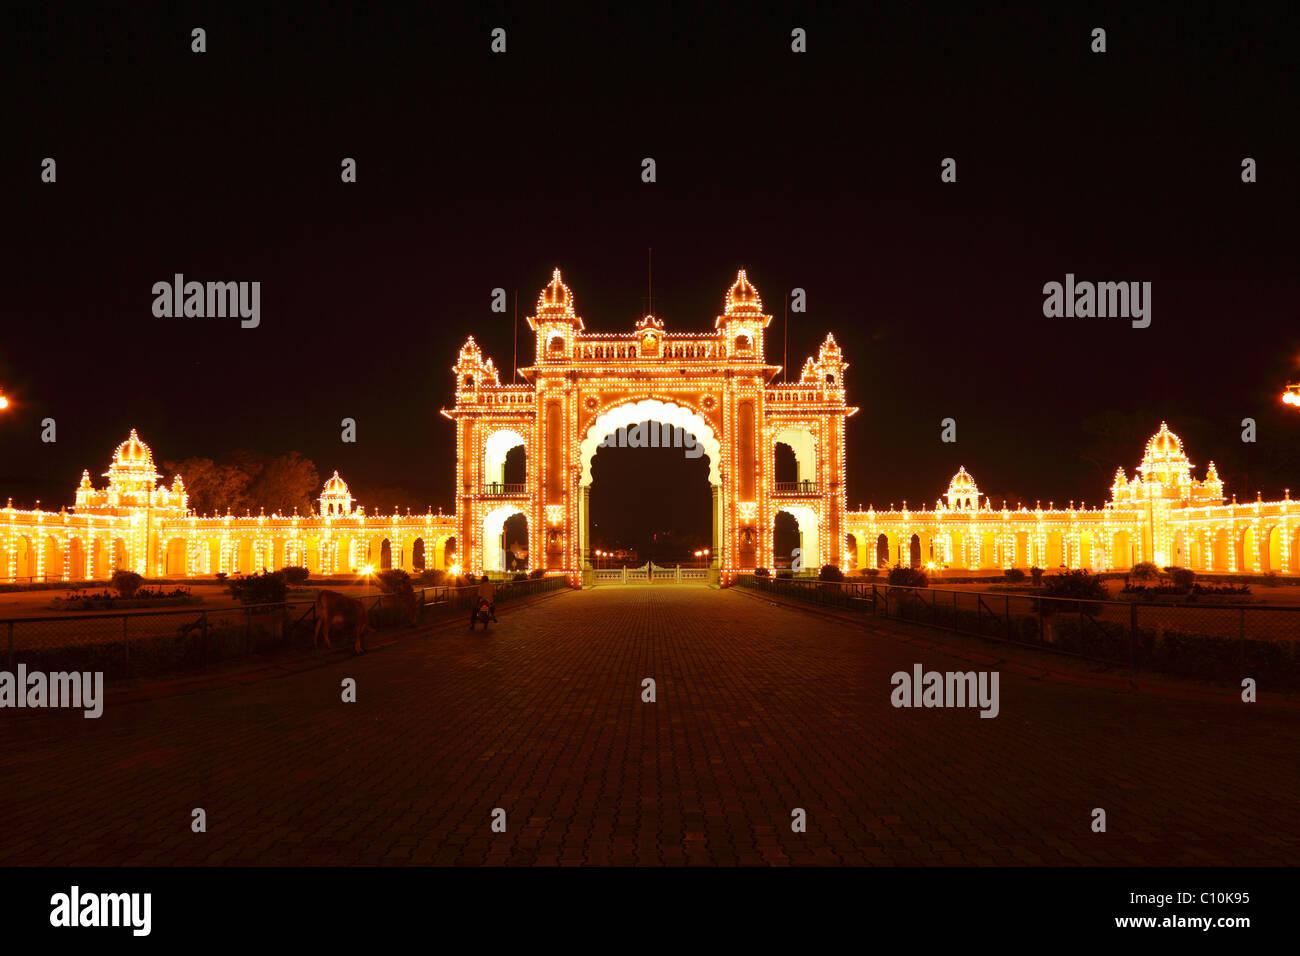 East Gate of the Maharaja's Palace Mysore Palace, Sunday illumination with incandescent lamps, , South India, - Stock Image